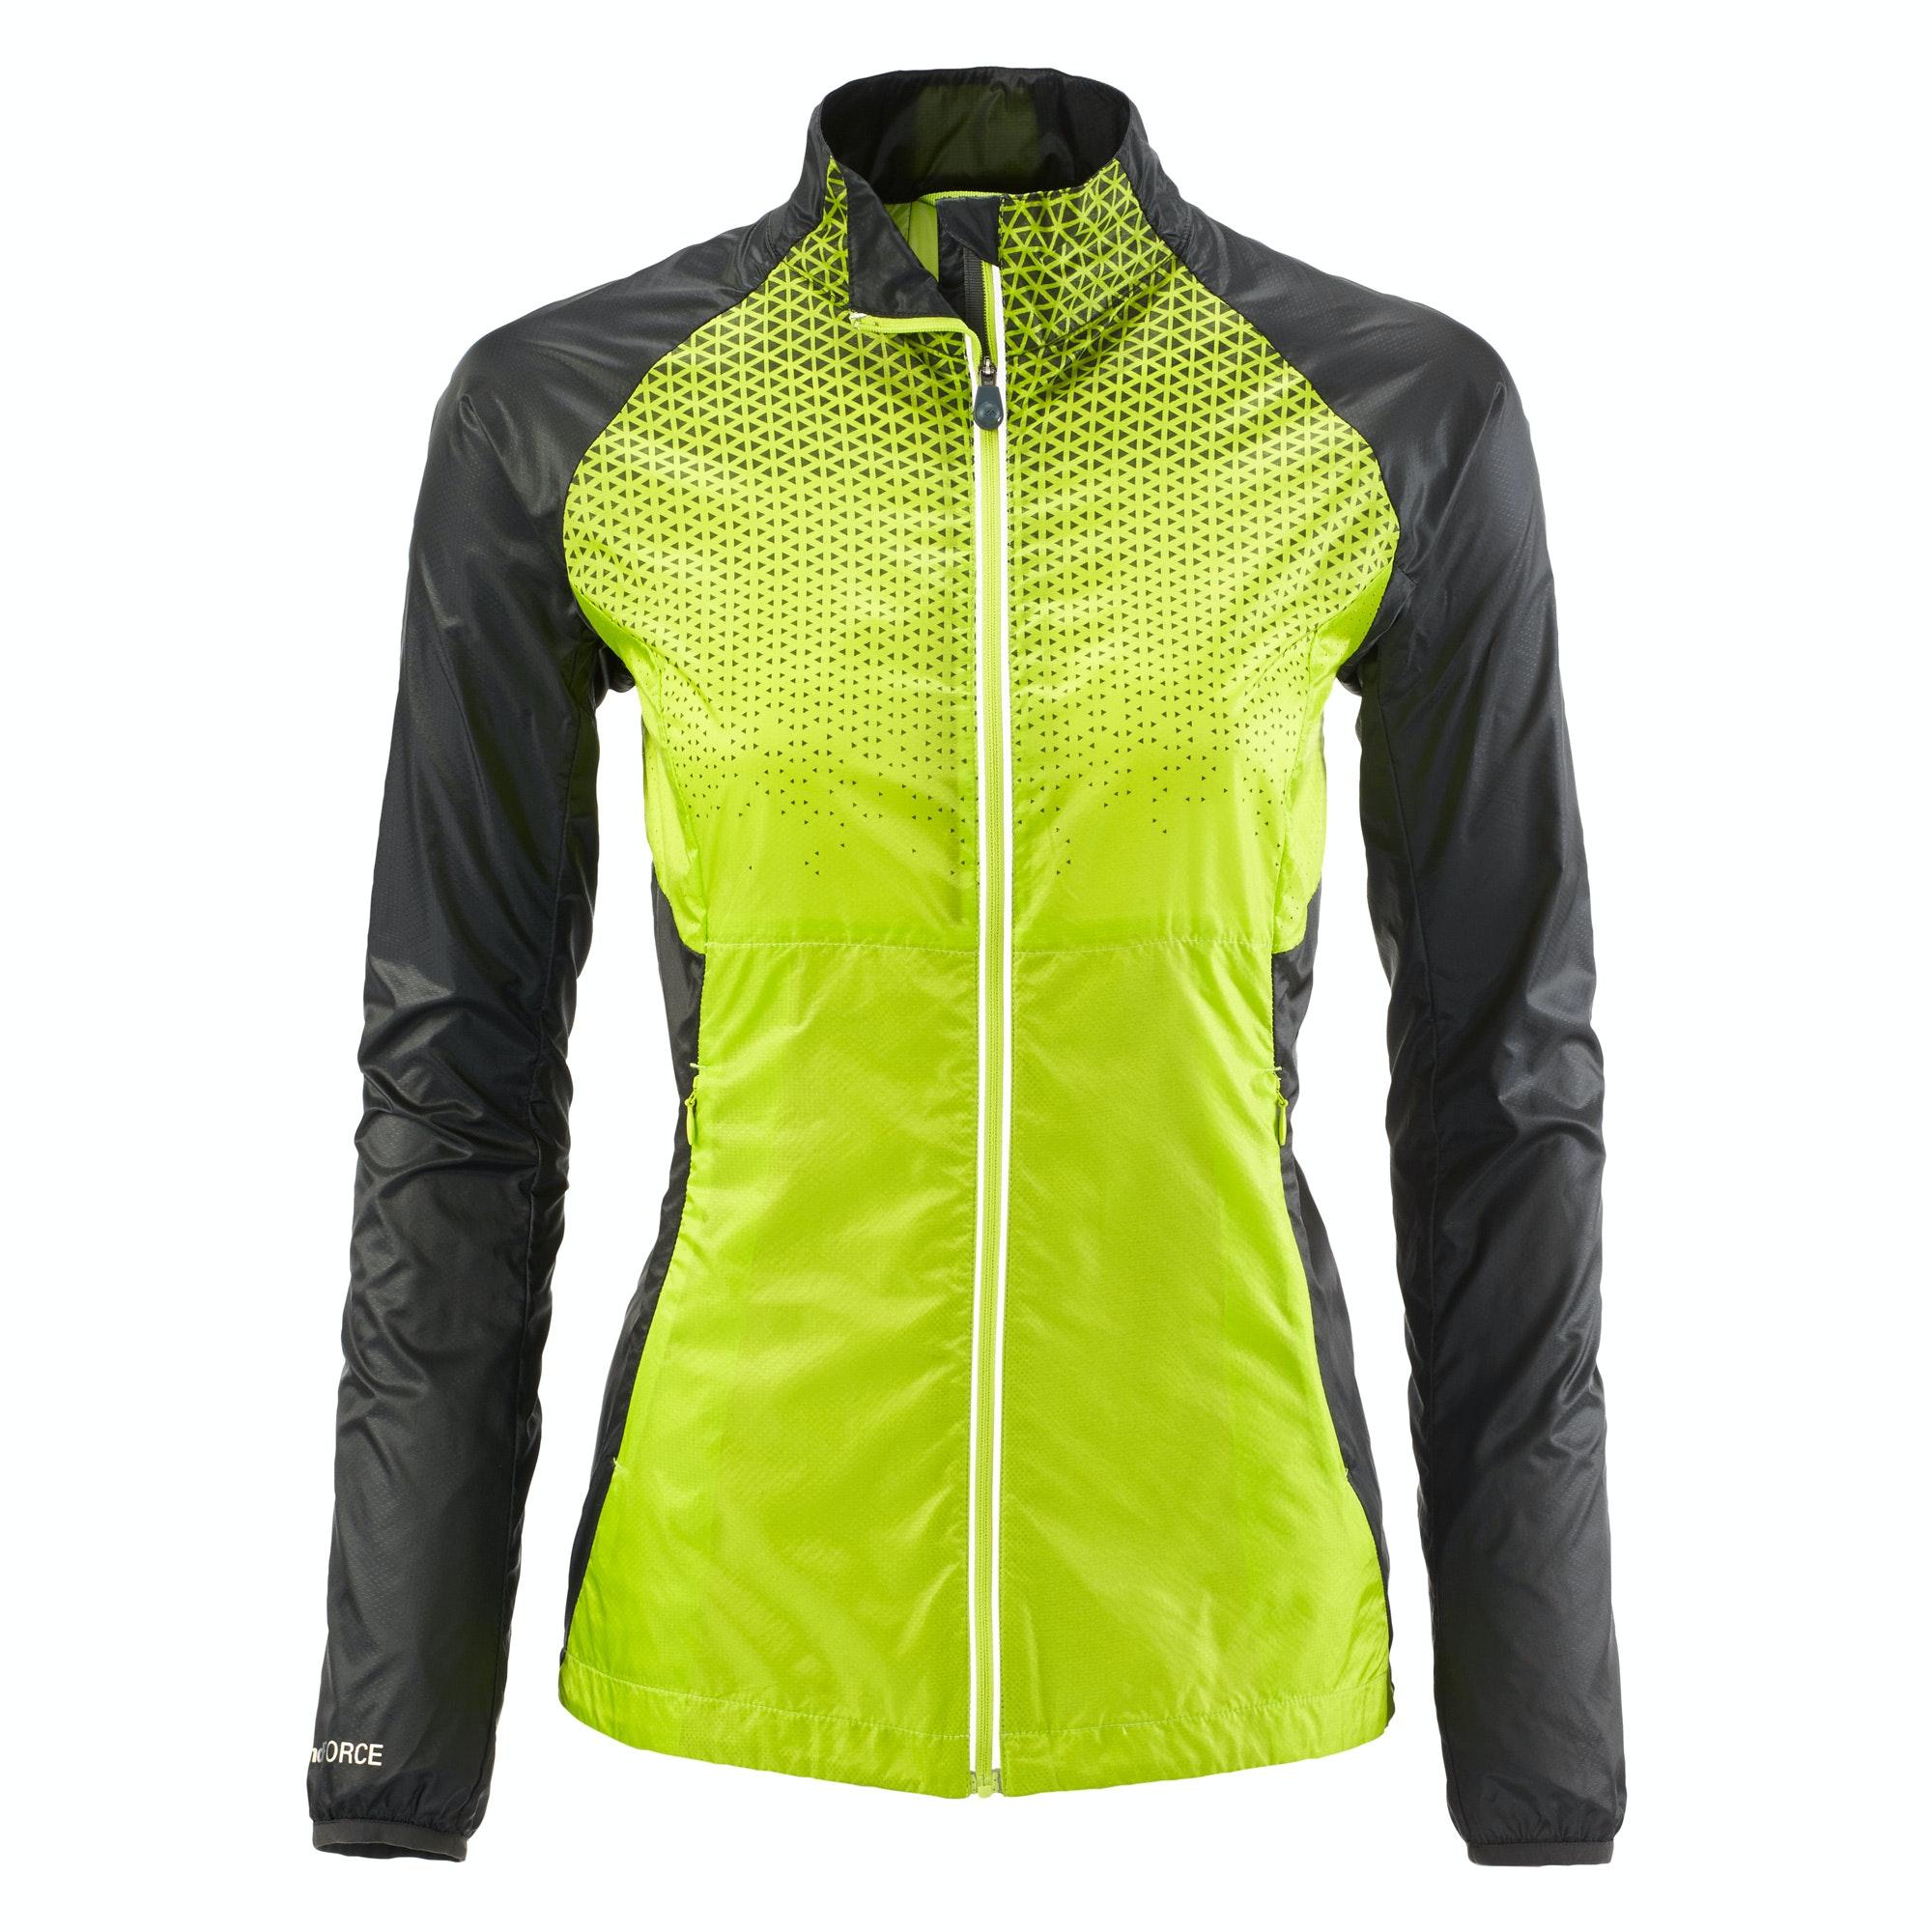 9d8ce976f Details about NEW Kathmandu Lite Ace Pro Women's Windbreaker Reflective  Active Running Jacket